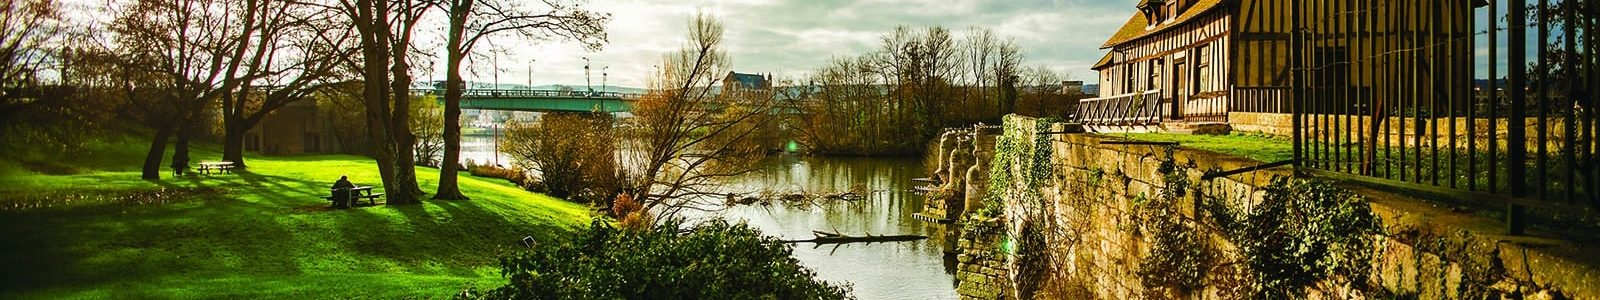 Vieux Moulin de Vernon © Sylvain Bachelot